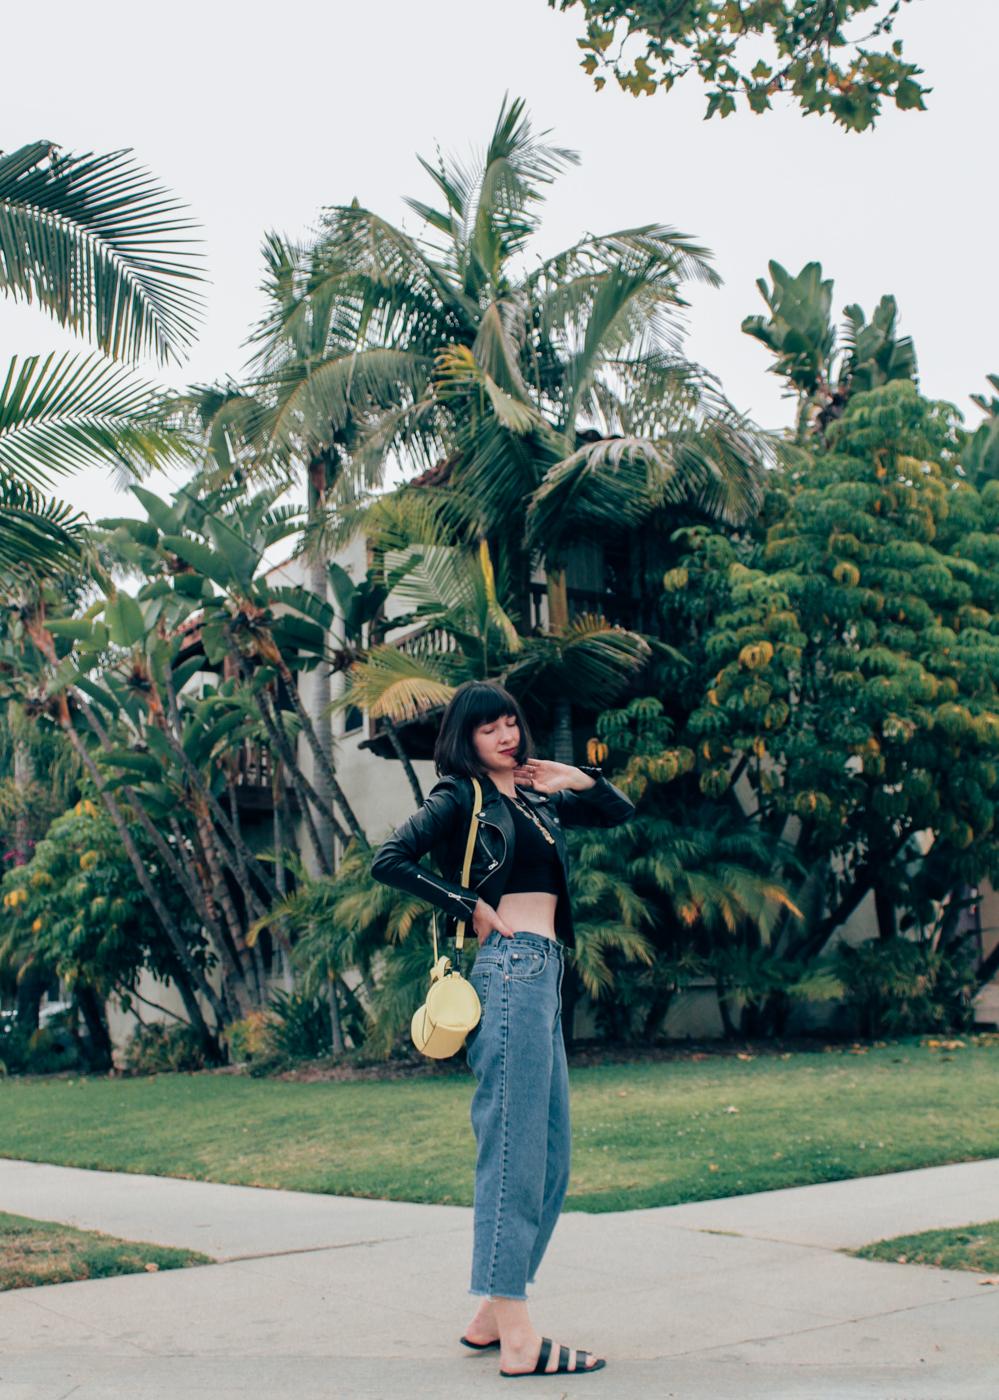 palmtrees-6